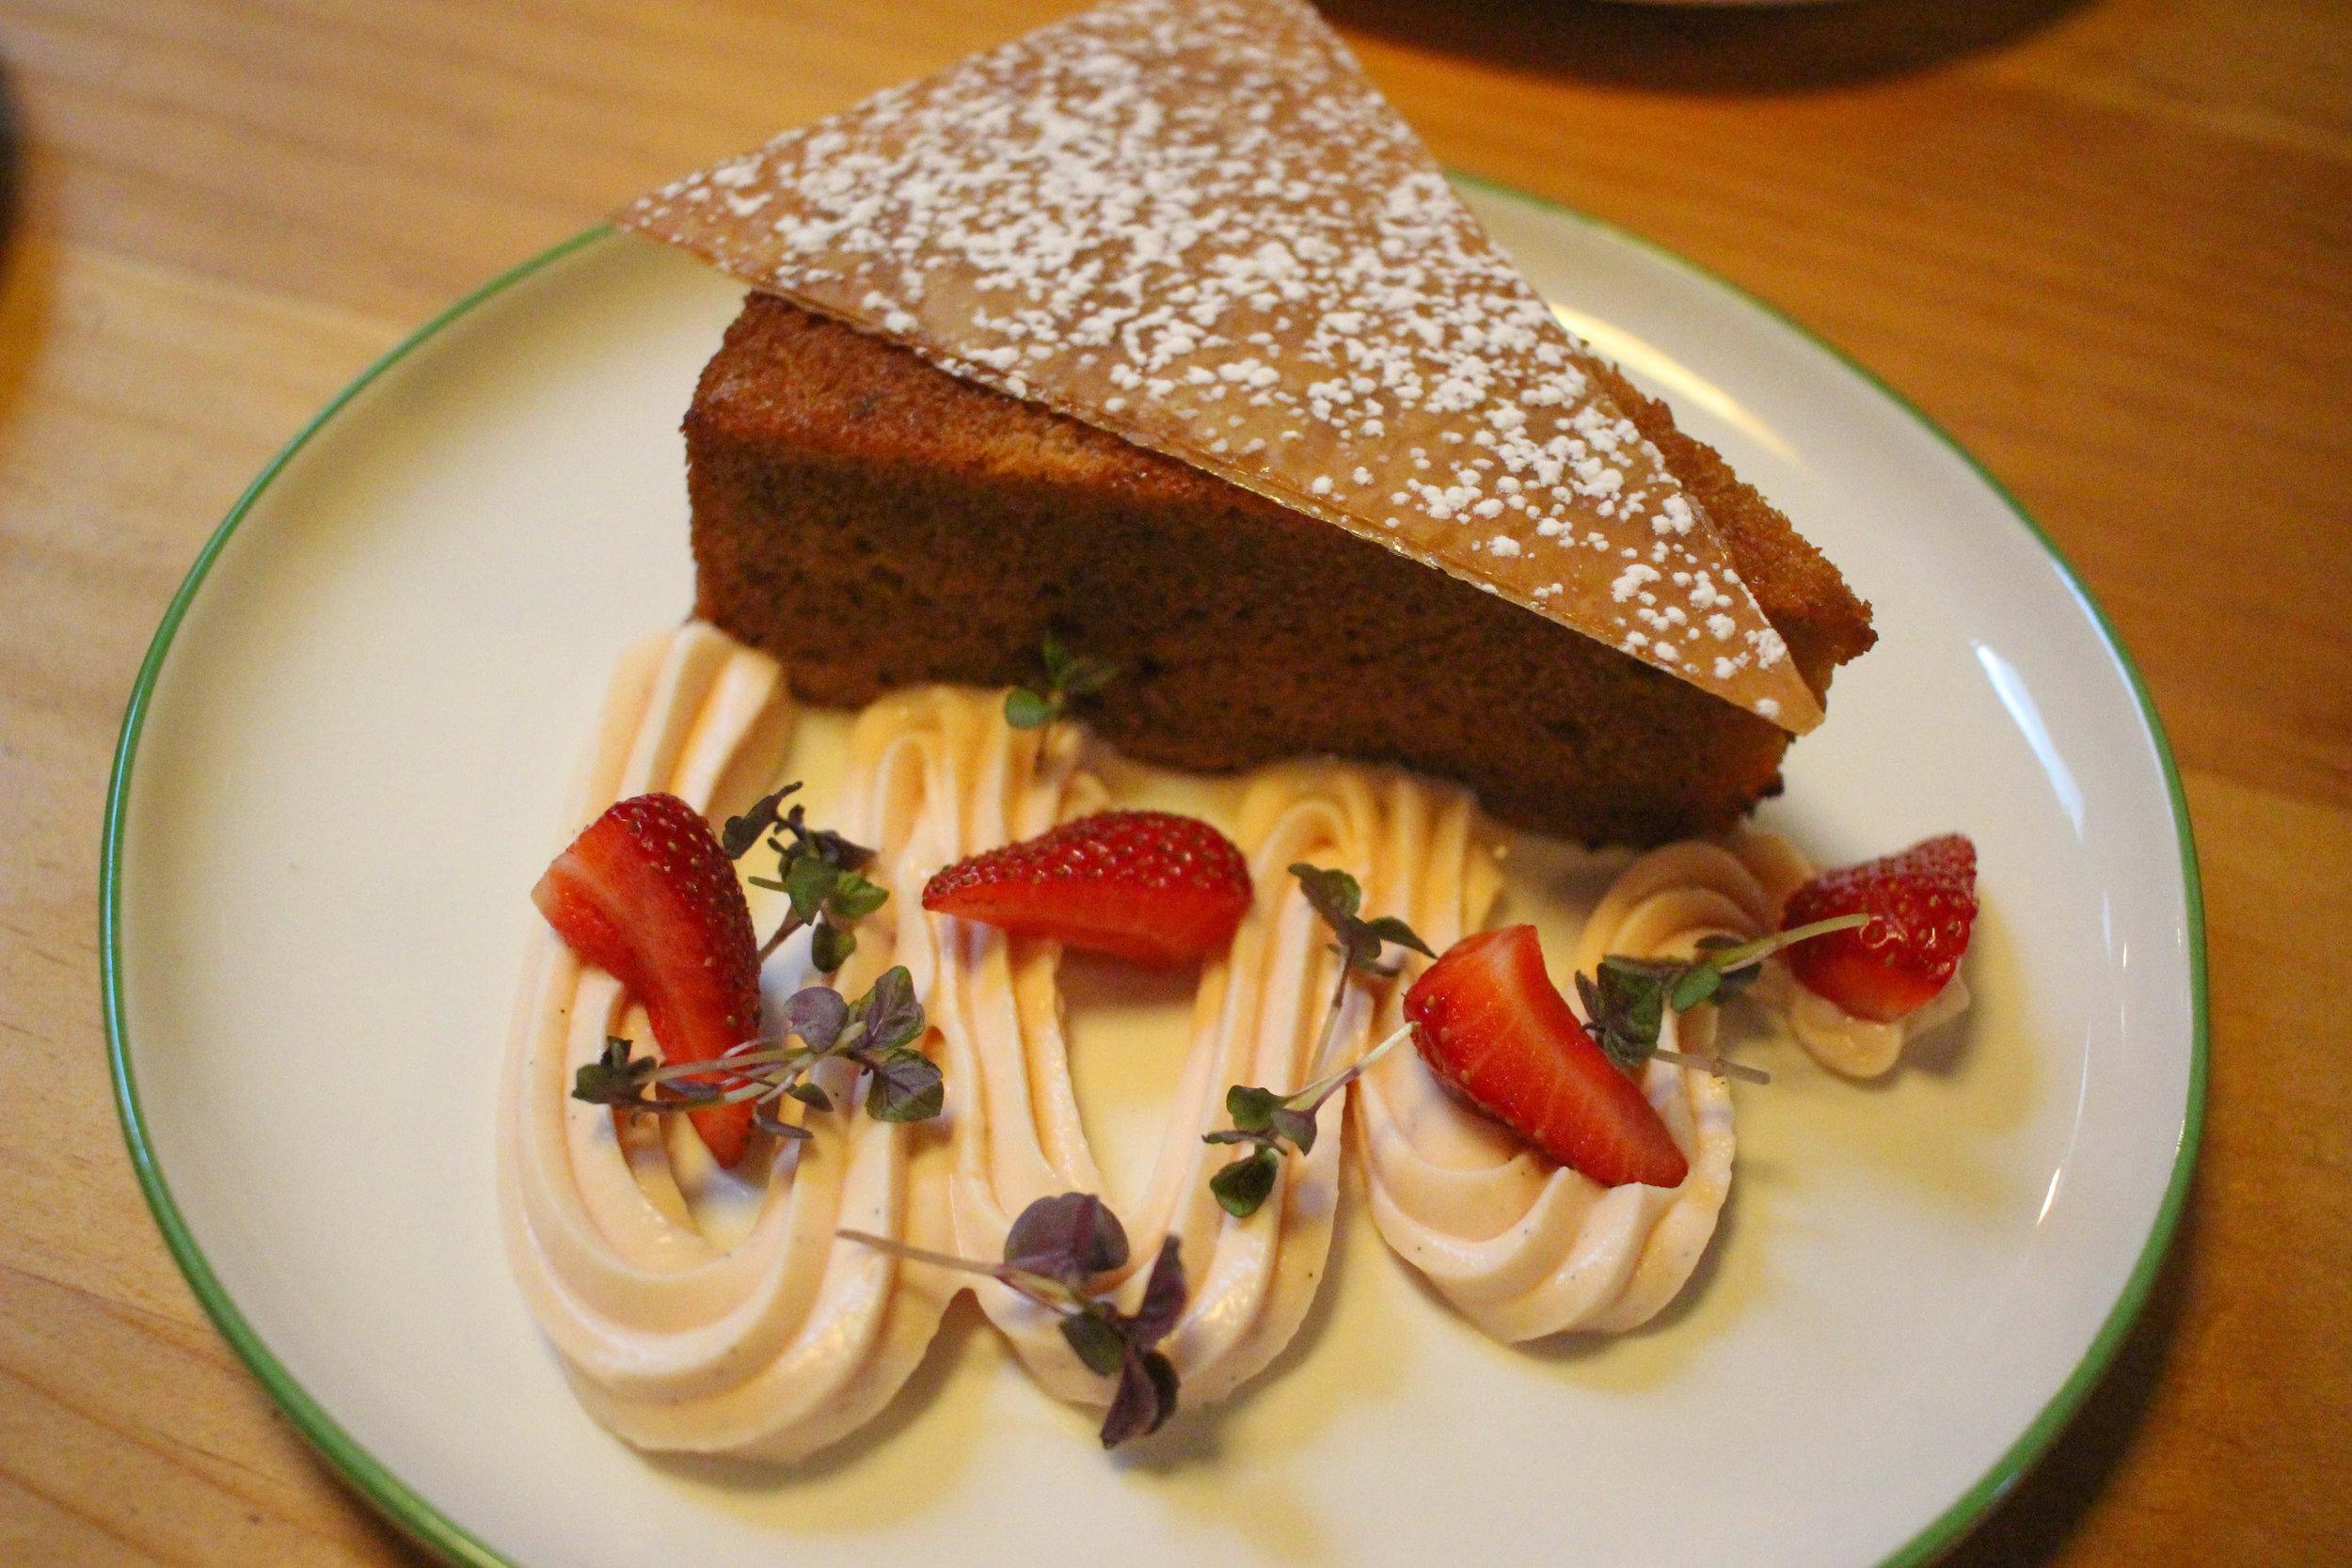 Guava mochi cake, white chocolate buttermilk cream, caramelized phyllo, strawberries